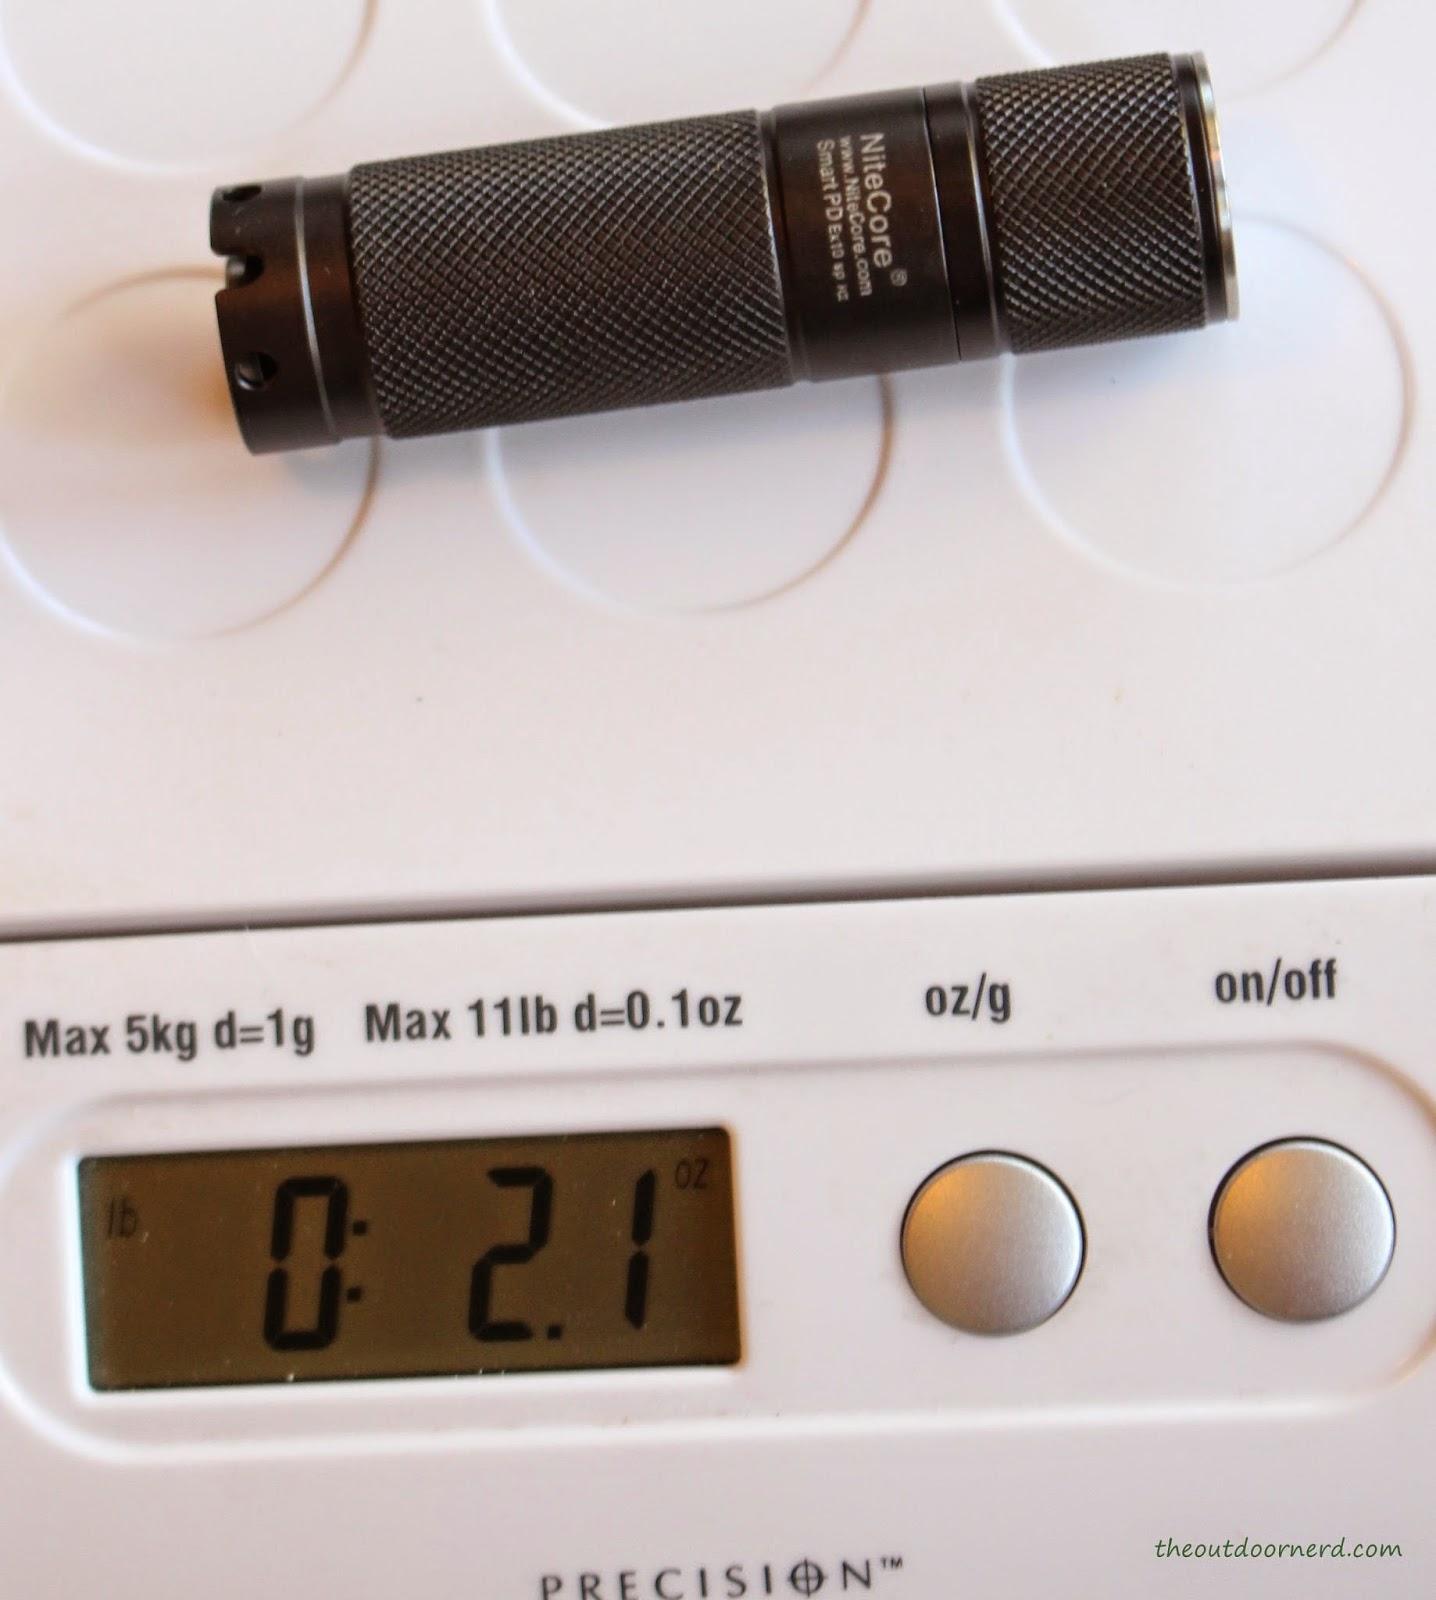 Nitecore Ex10 1xCR123A Flashlight On Scale